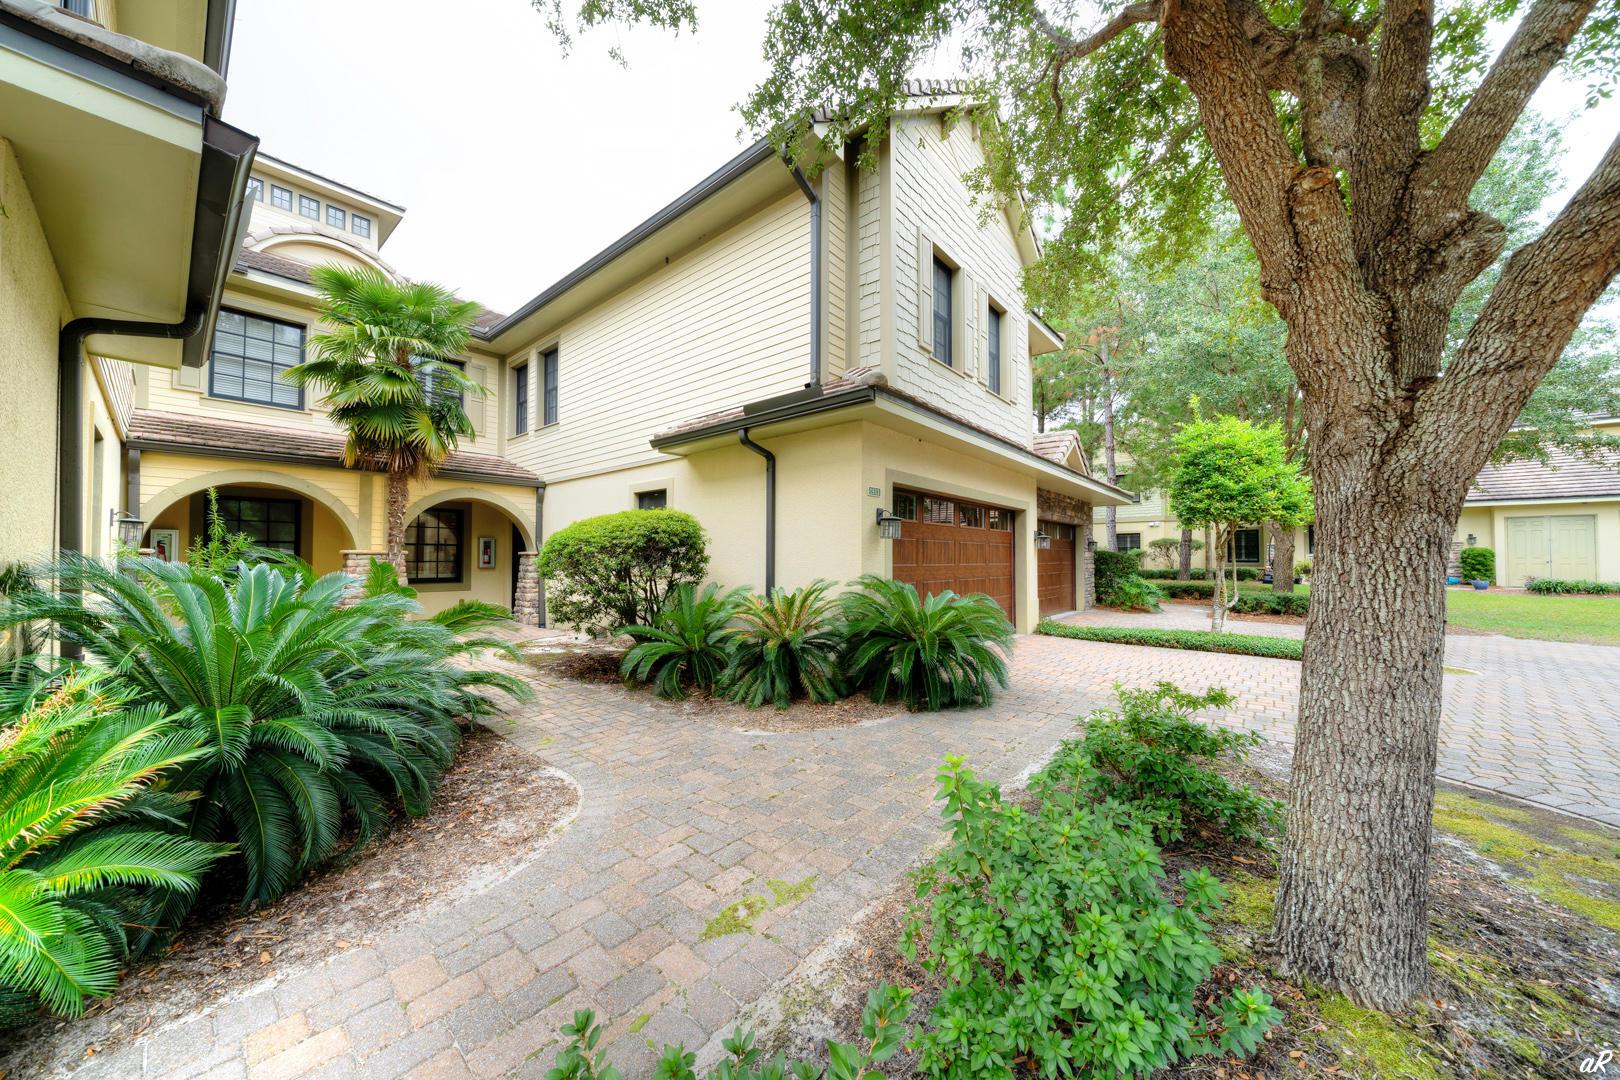 Photo of home for sale at 1413 Salamander, Panama City Beach FL